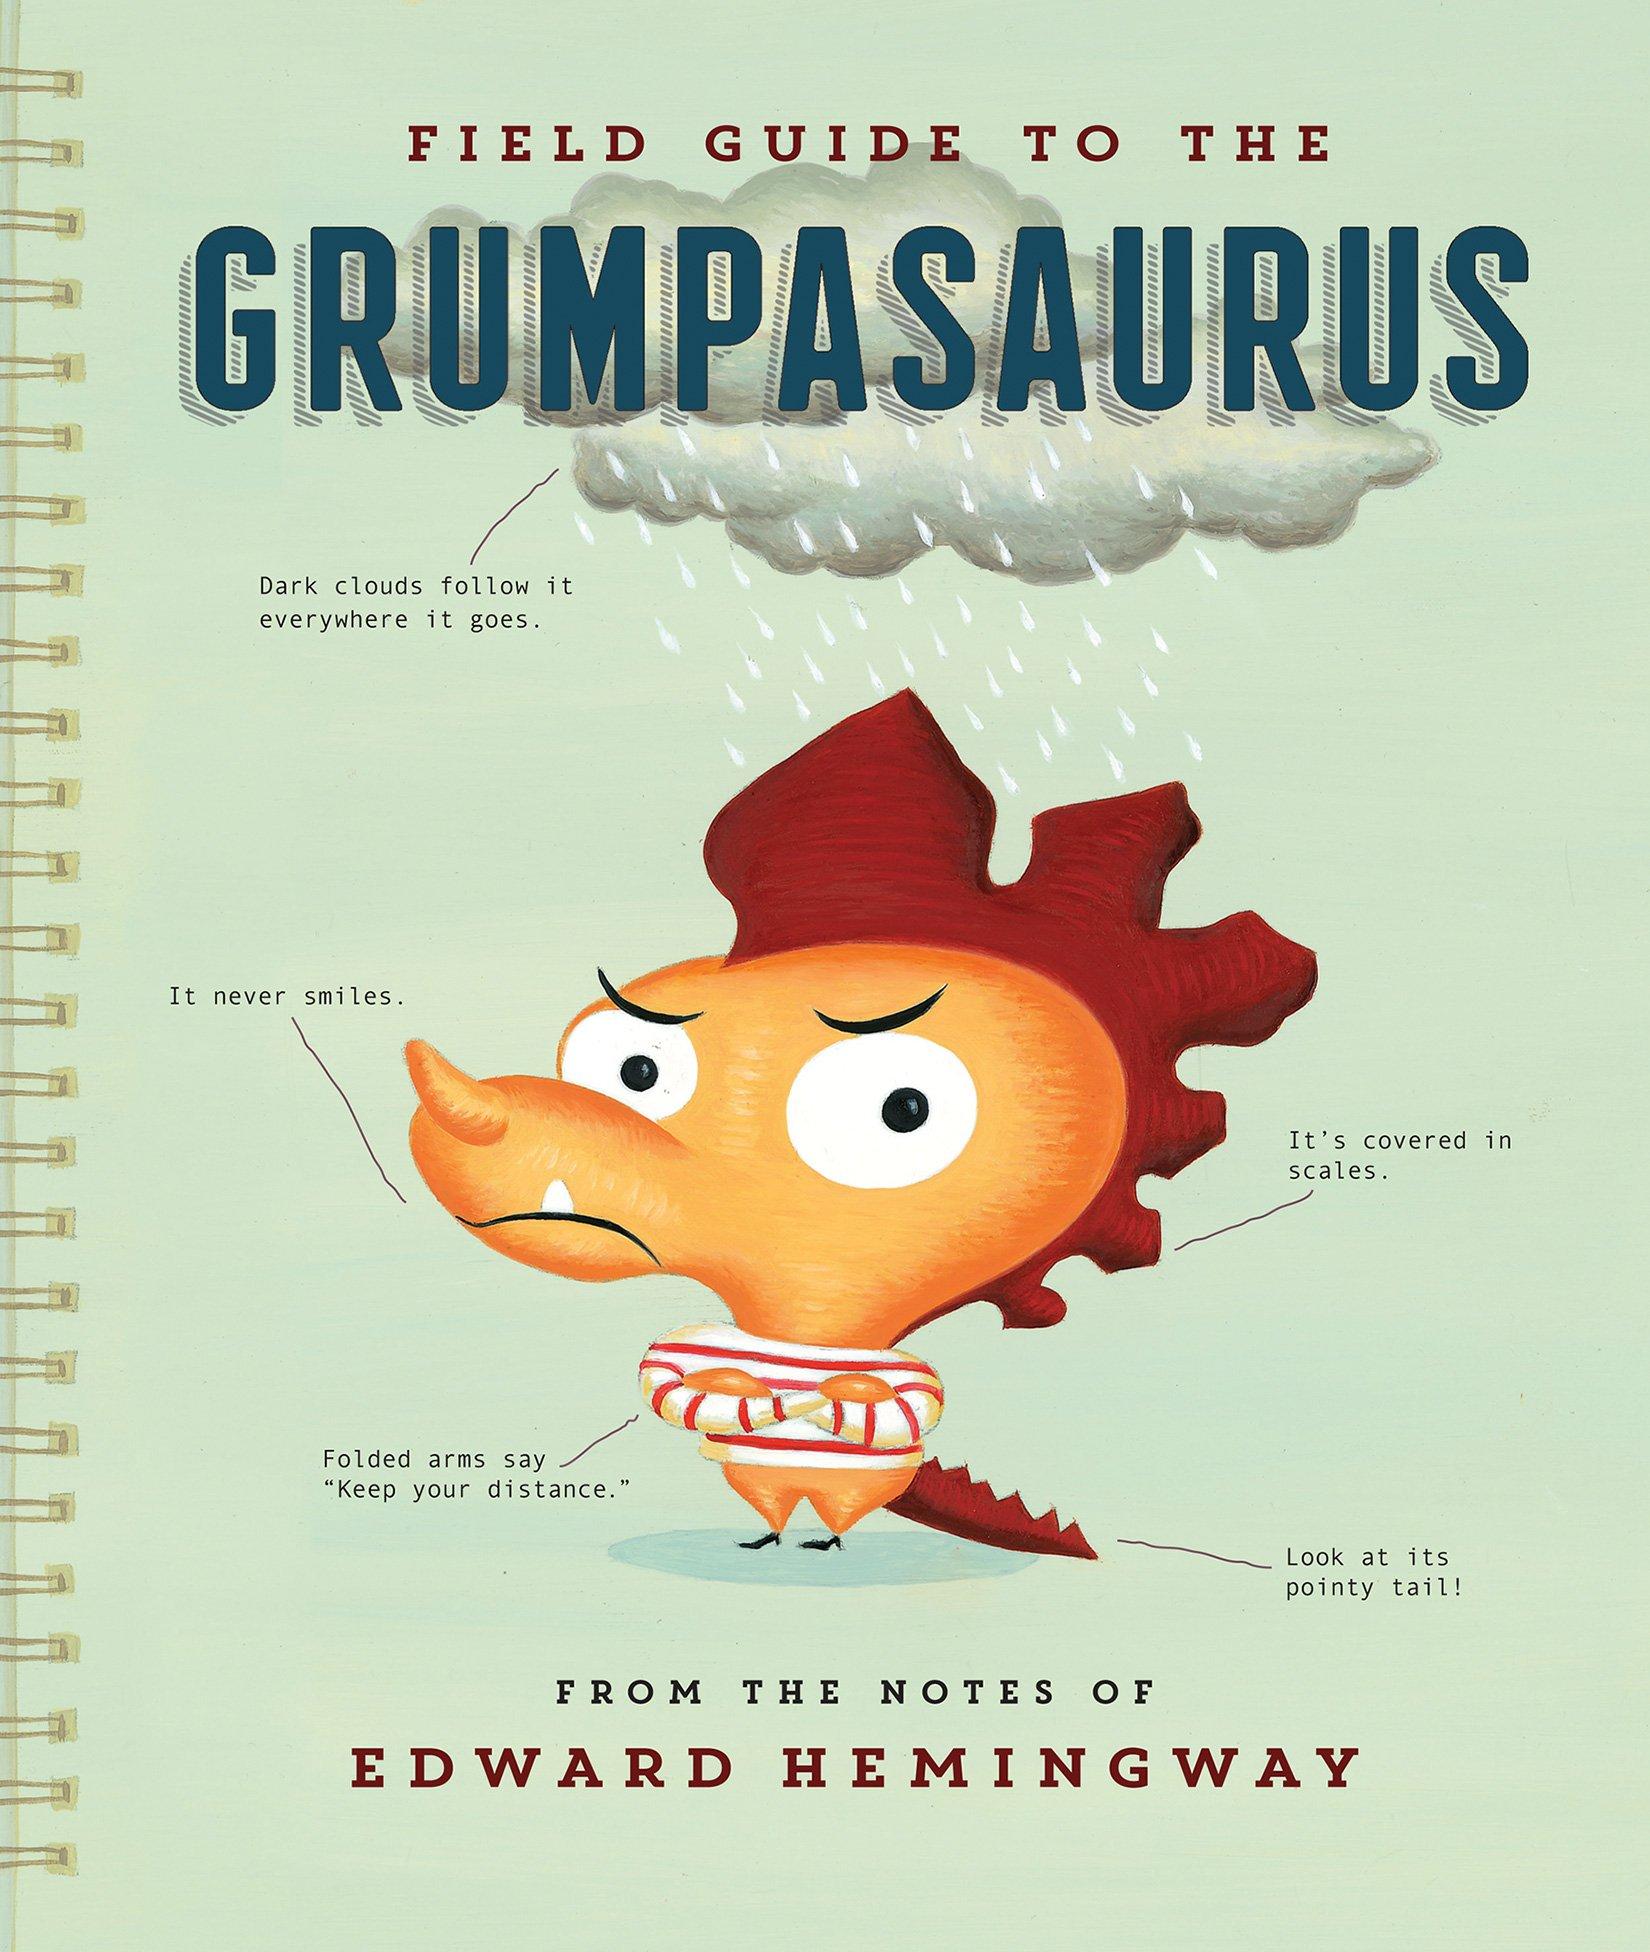 Hemingway, Edward 2016_06 - GRUMPASAURUS - PB - RLM PR.jpg